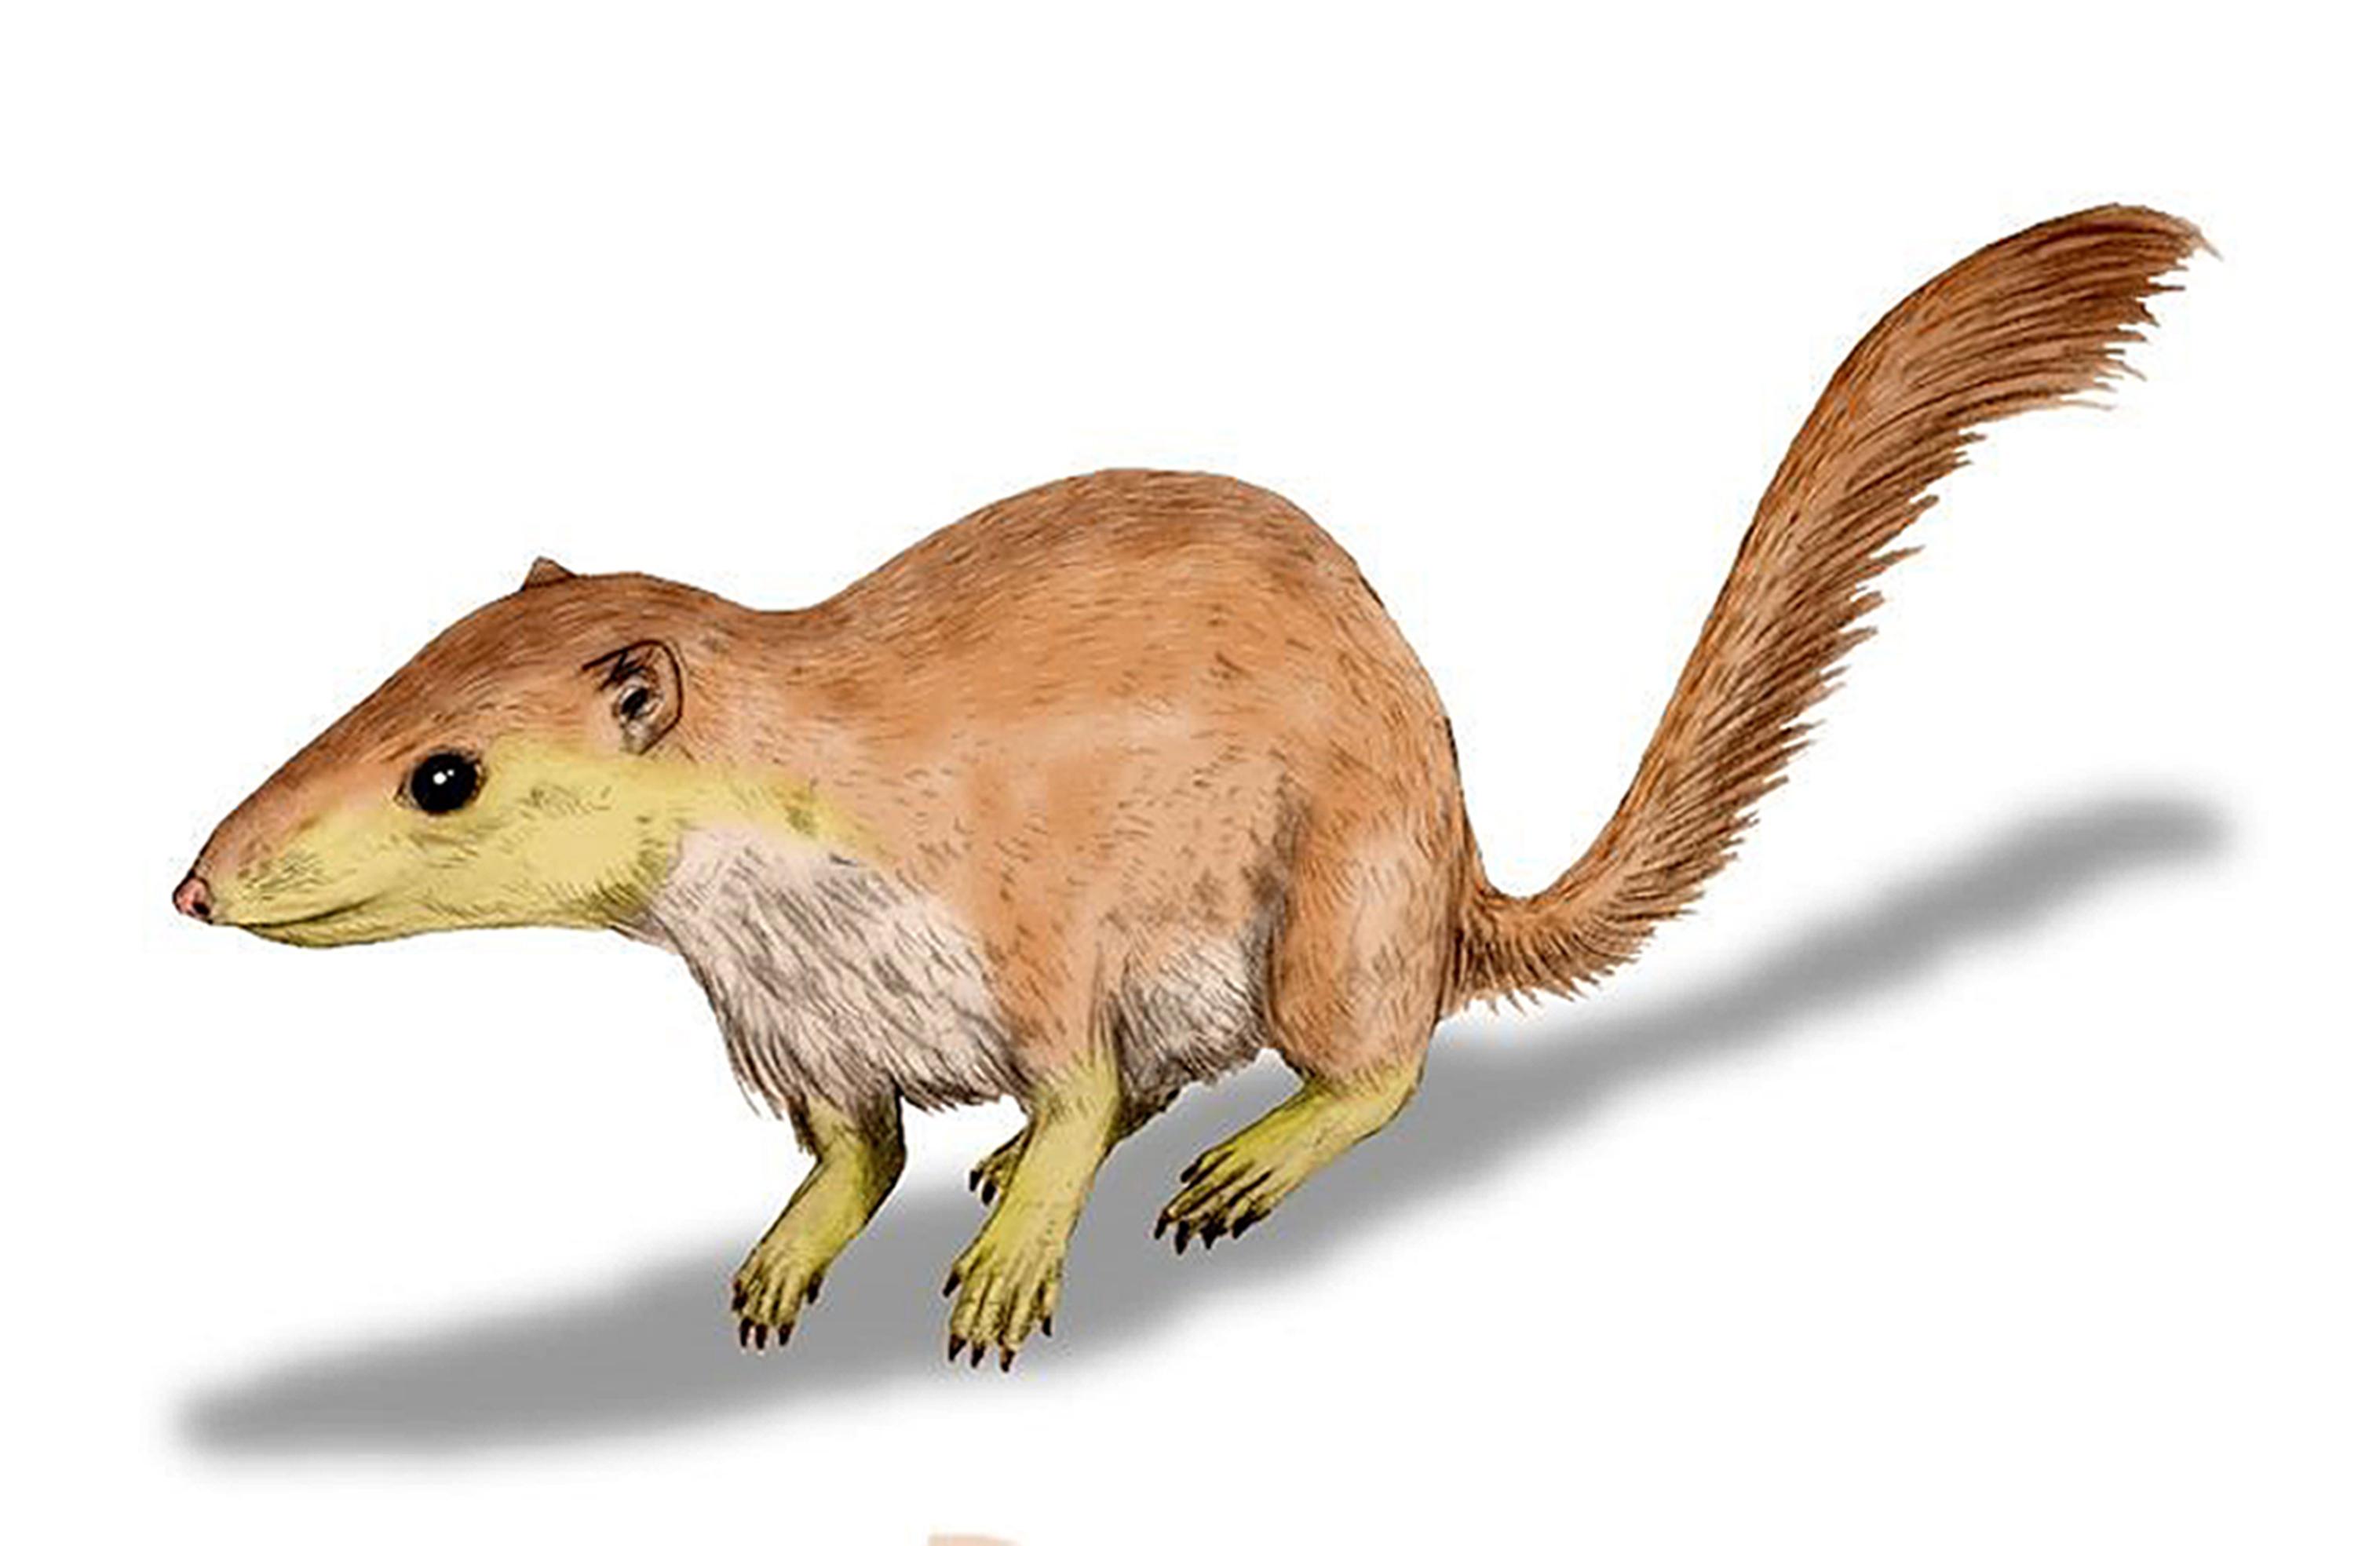 A reconstruction of early mammal Purgatorius unio (Nobu Tamura/University of Southampton/PA Wire)